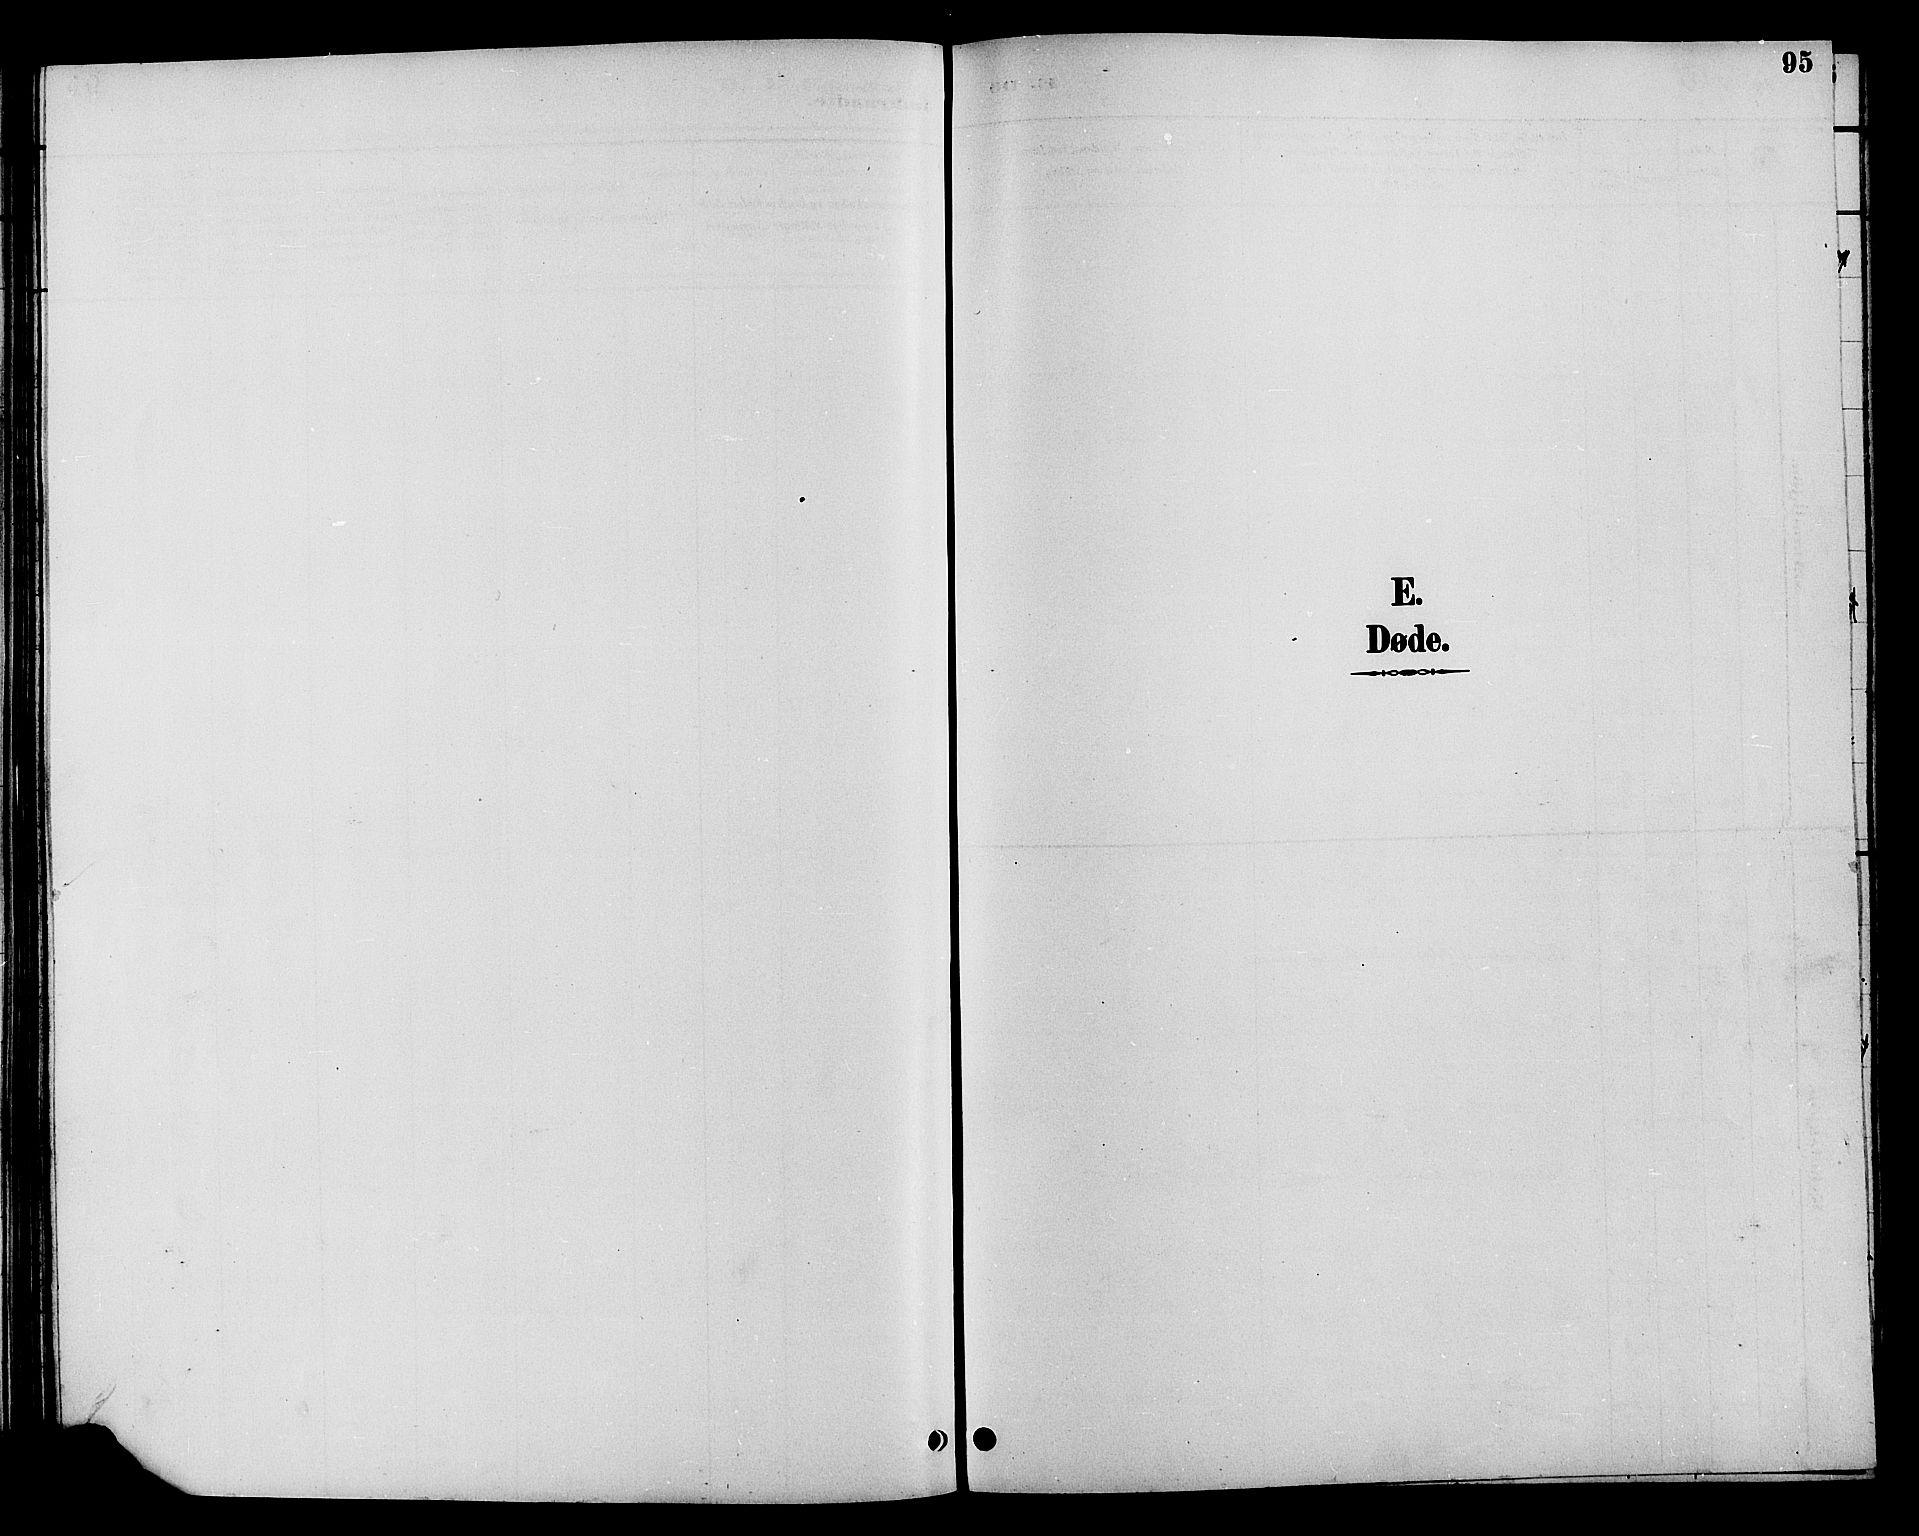 SAH, Øystre Slidre prestekontor, Klokkerbok nr. 4, 1887-1907, s. 95